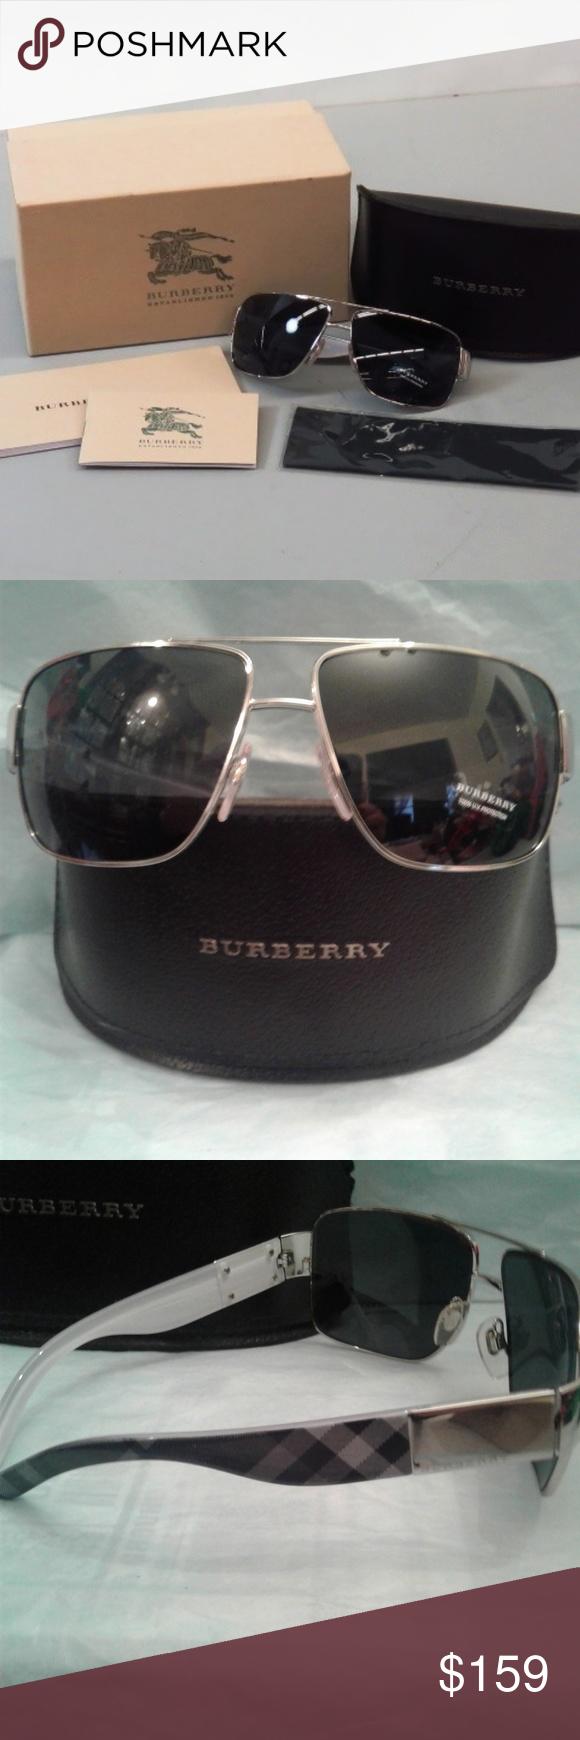 f08ff804f0dc ⭐NWOT⭐😎Burberry Unisex Sunglasses 😎 ⭐NWOT ⭐😎 Burberry Unisex full gold  tone rim Aviator style sunglasses BE 3040 1005 87😎 Still has original  sticker ...